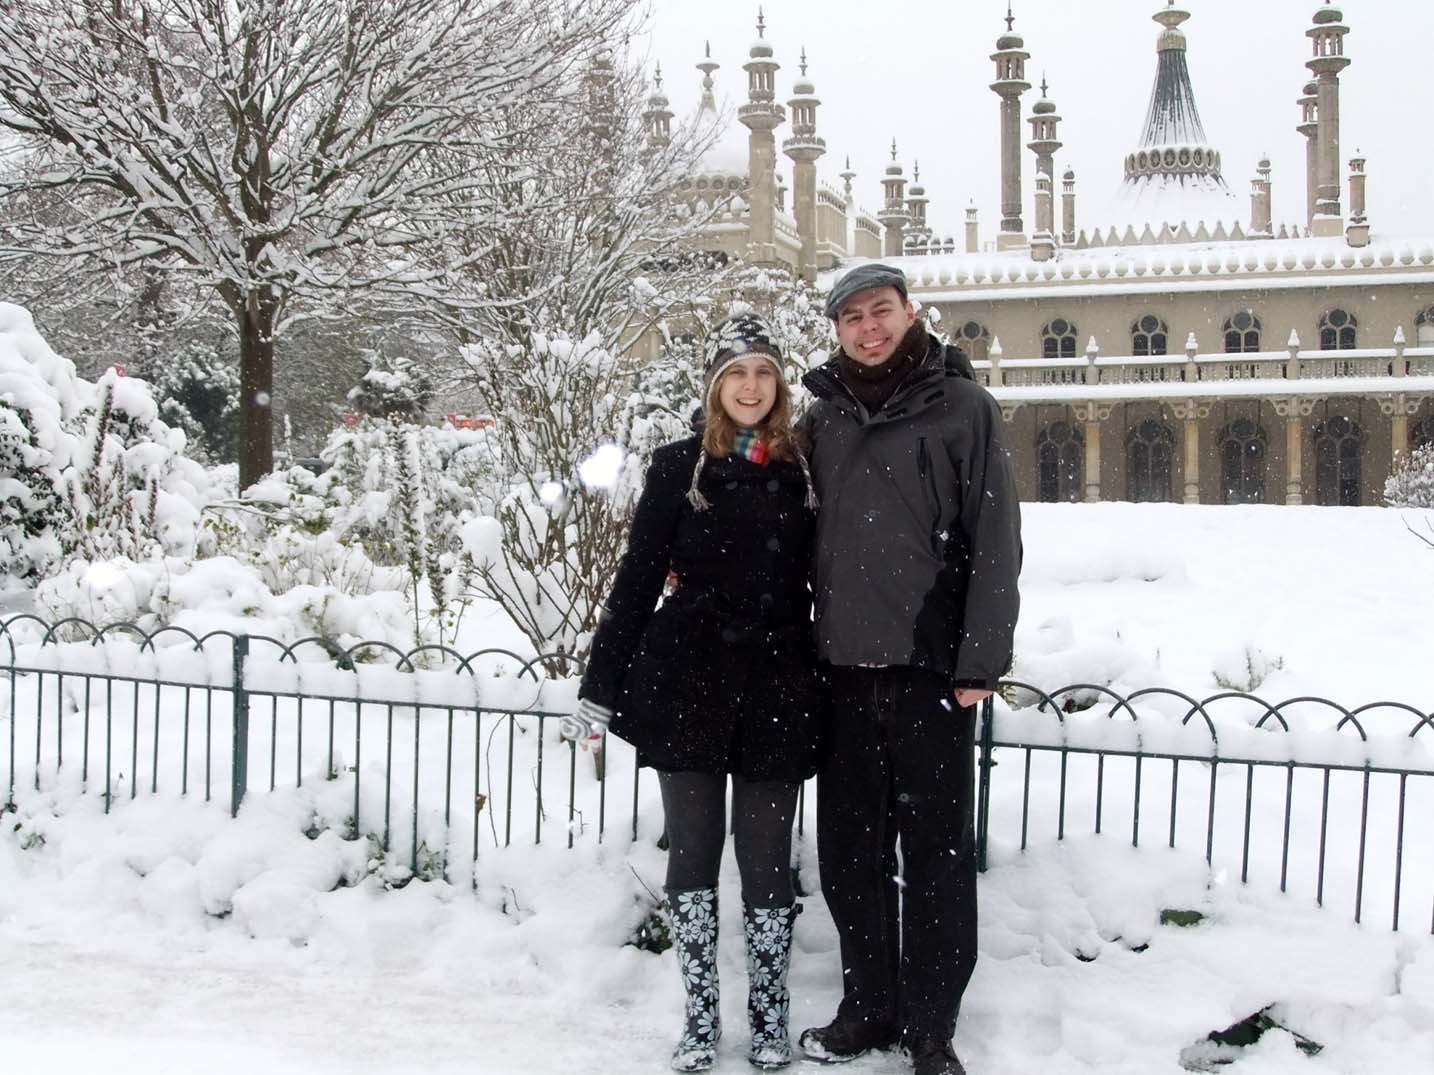 Brighton Pavilion winter